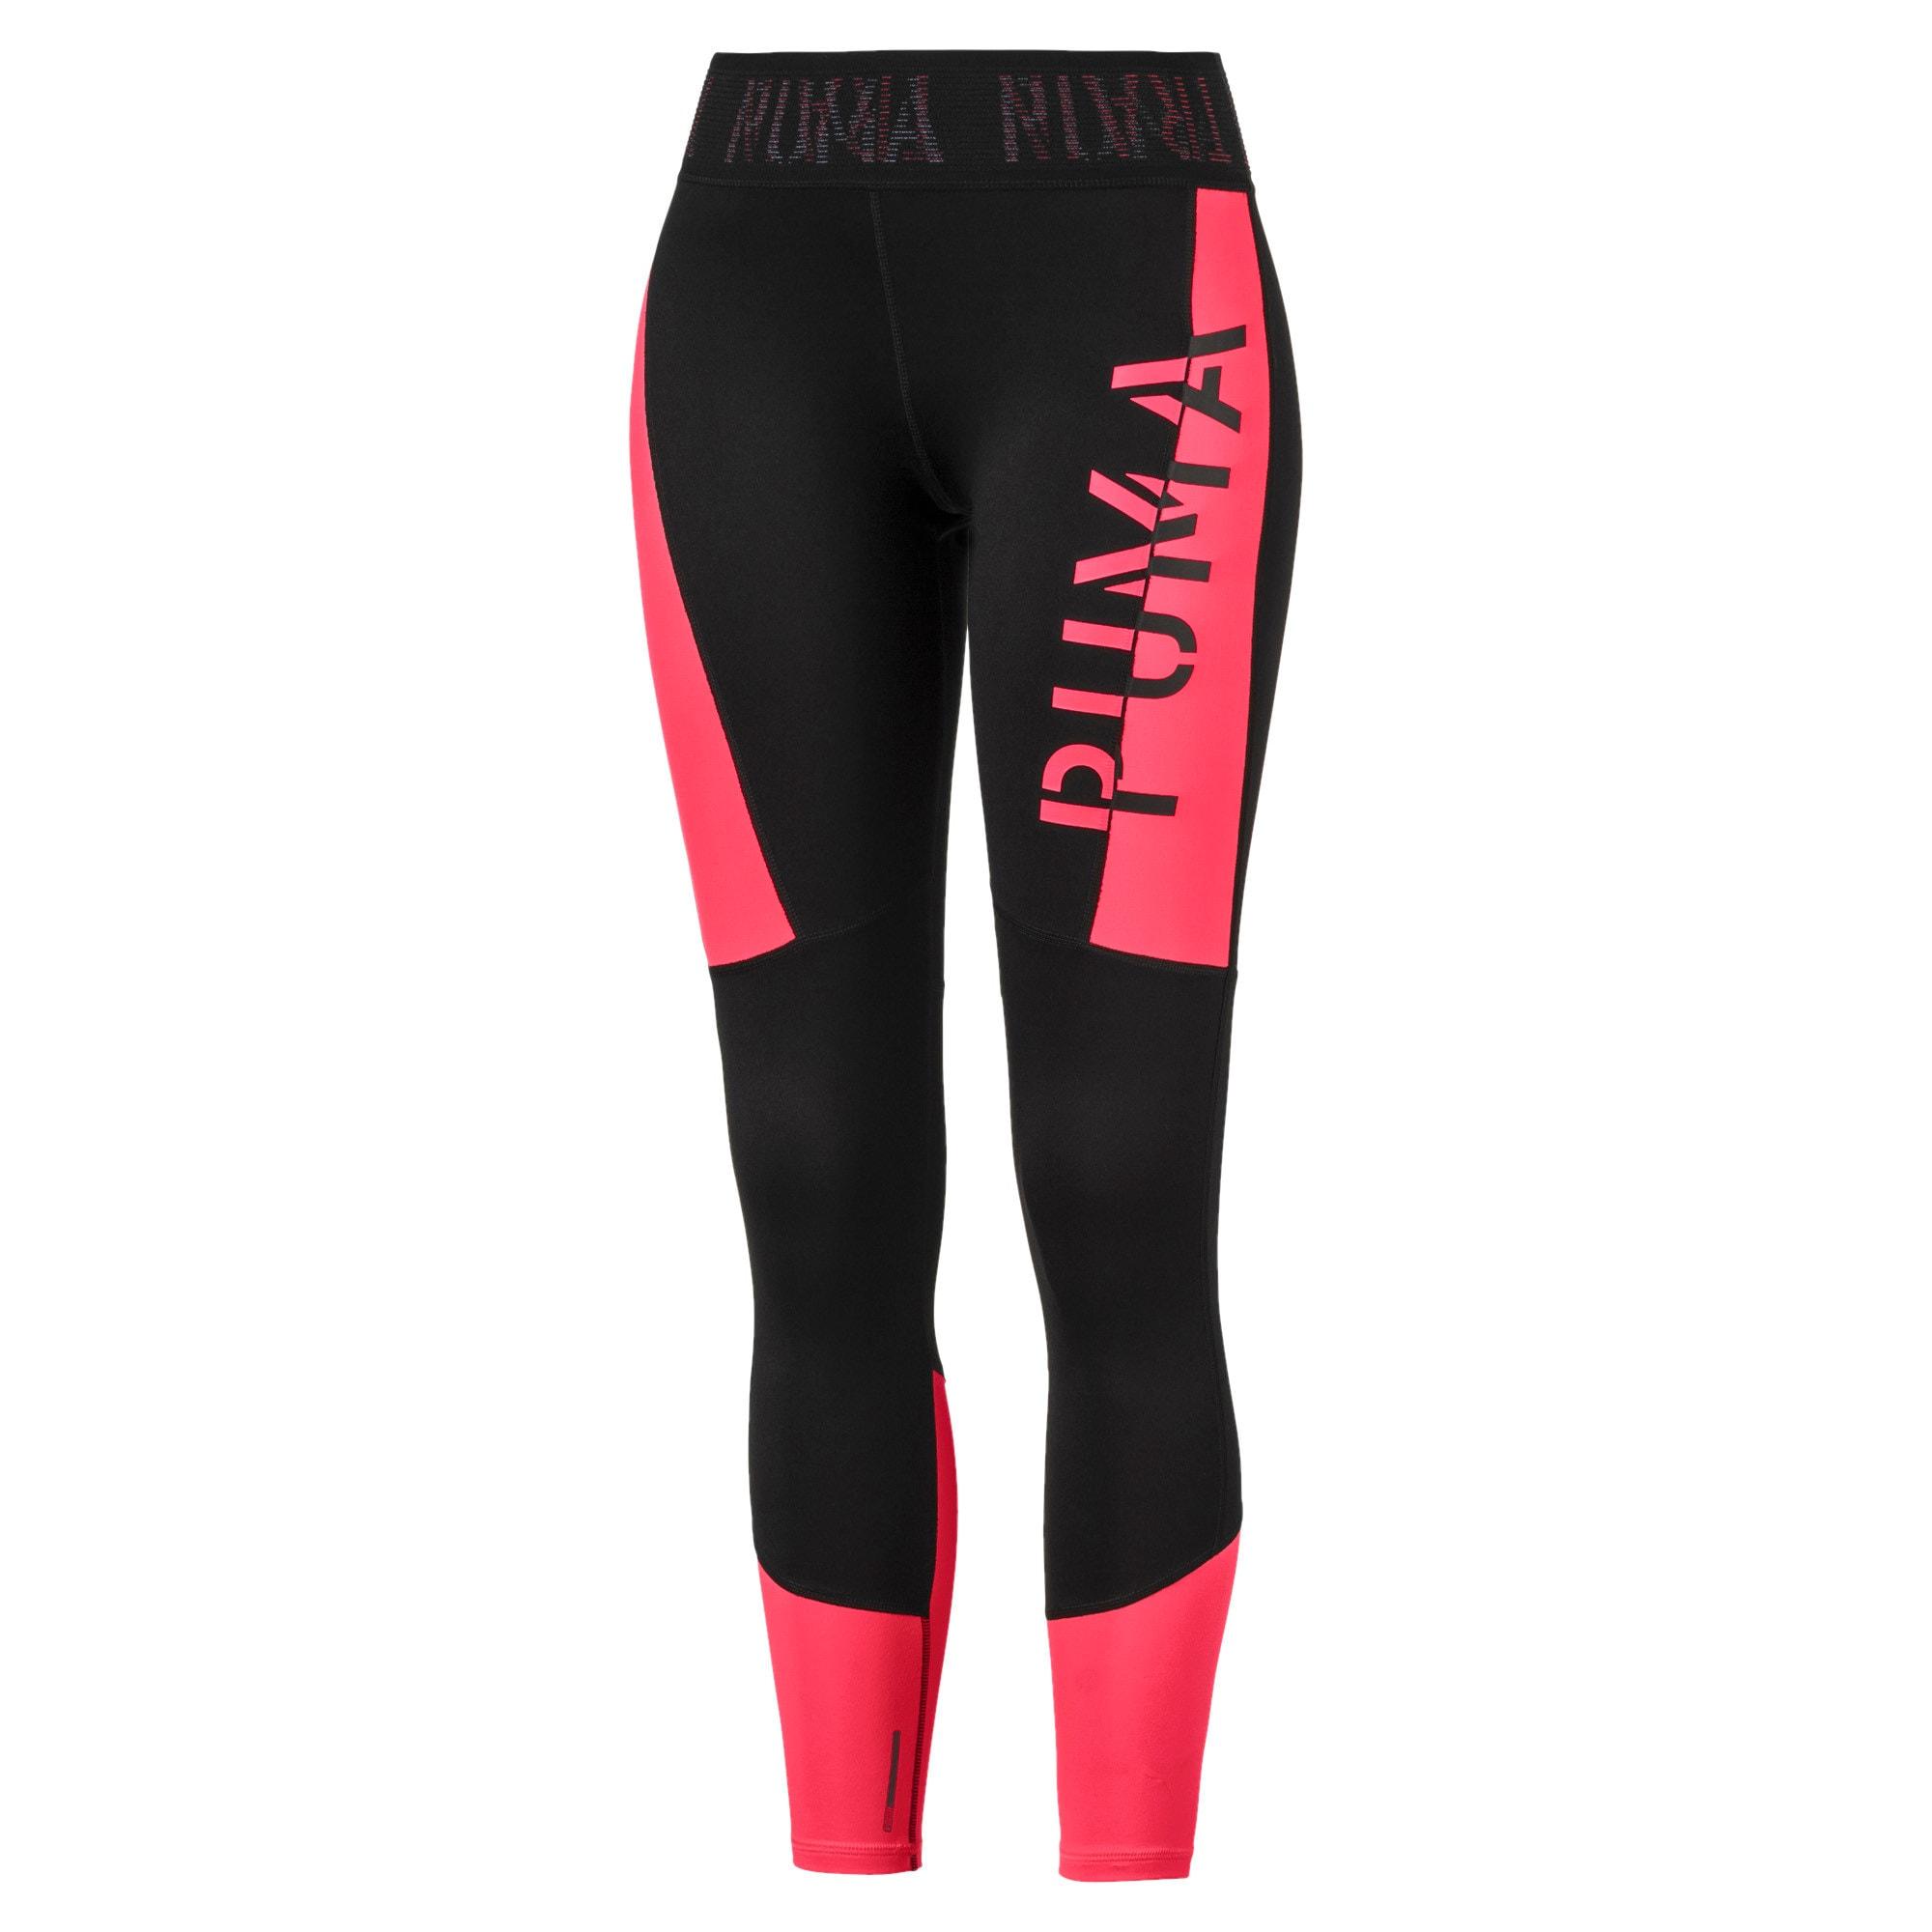 Thumbnail 4 of ADHM 2019 Logo 7/8 Women's Training Leggings, Puma Black-Pink Alert, medium-IND